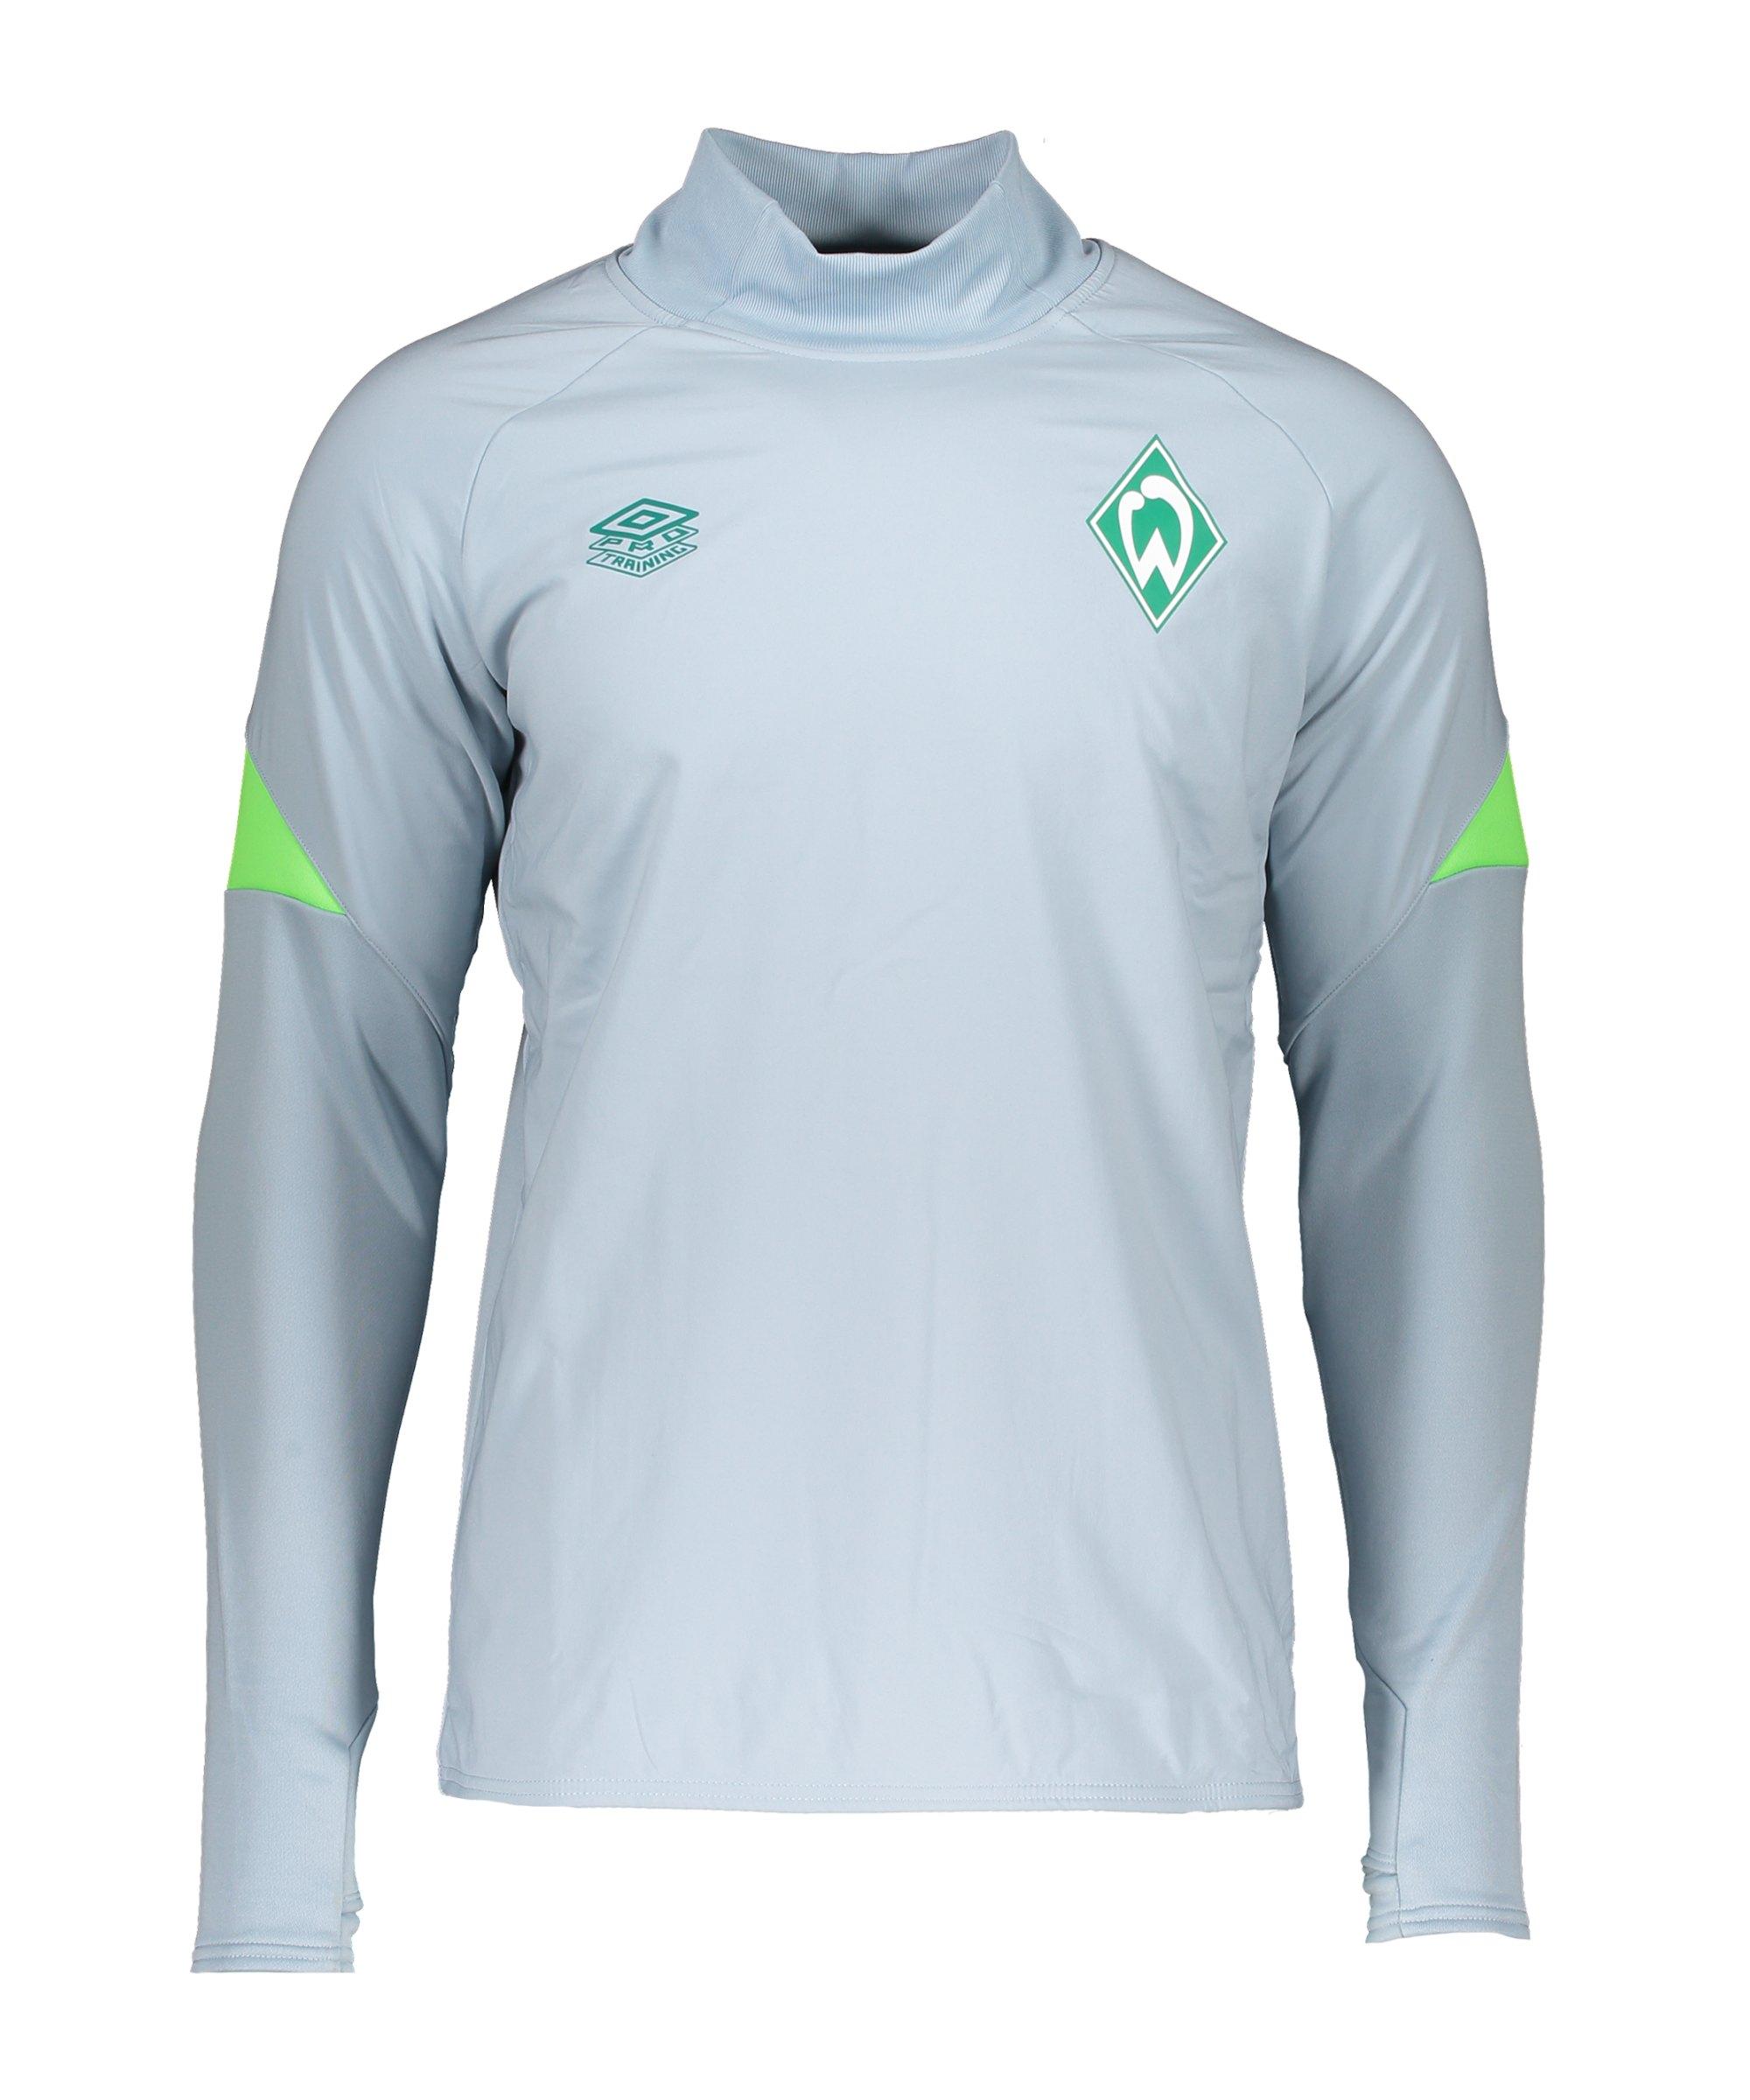 Umbro SV Werder Bremen Sweatshirt Top Blau - blau